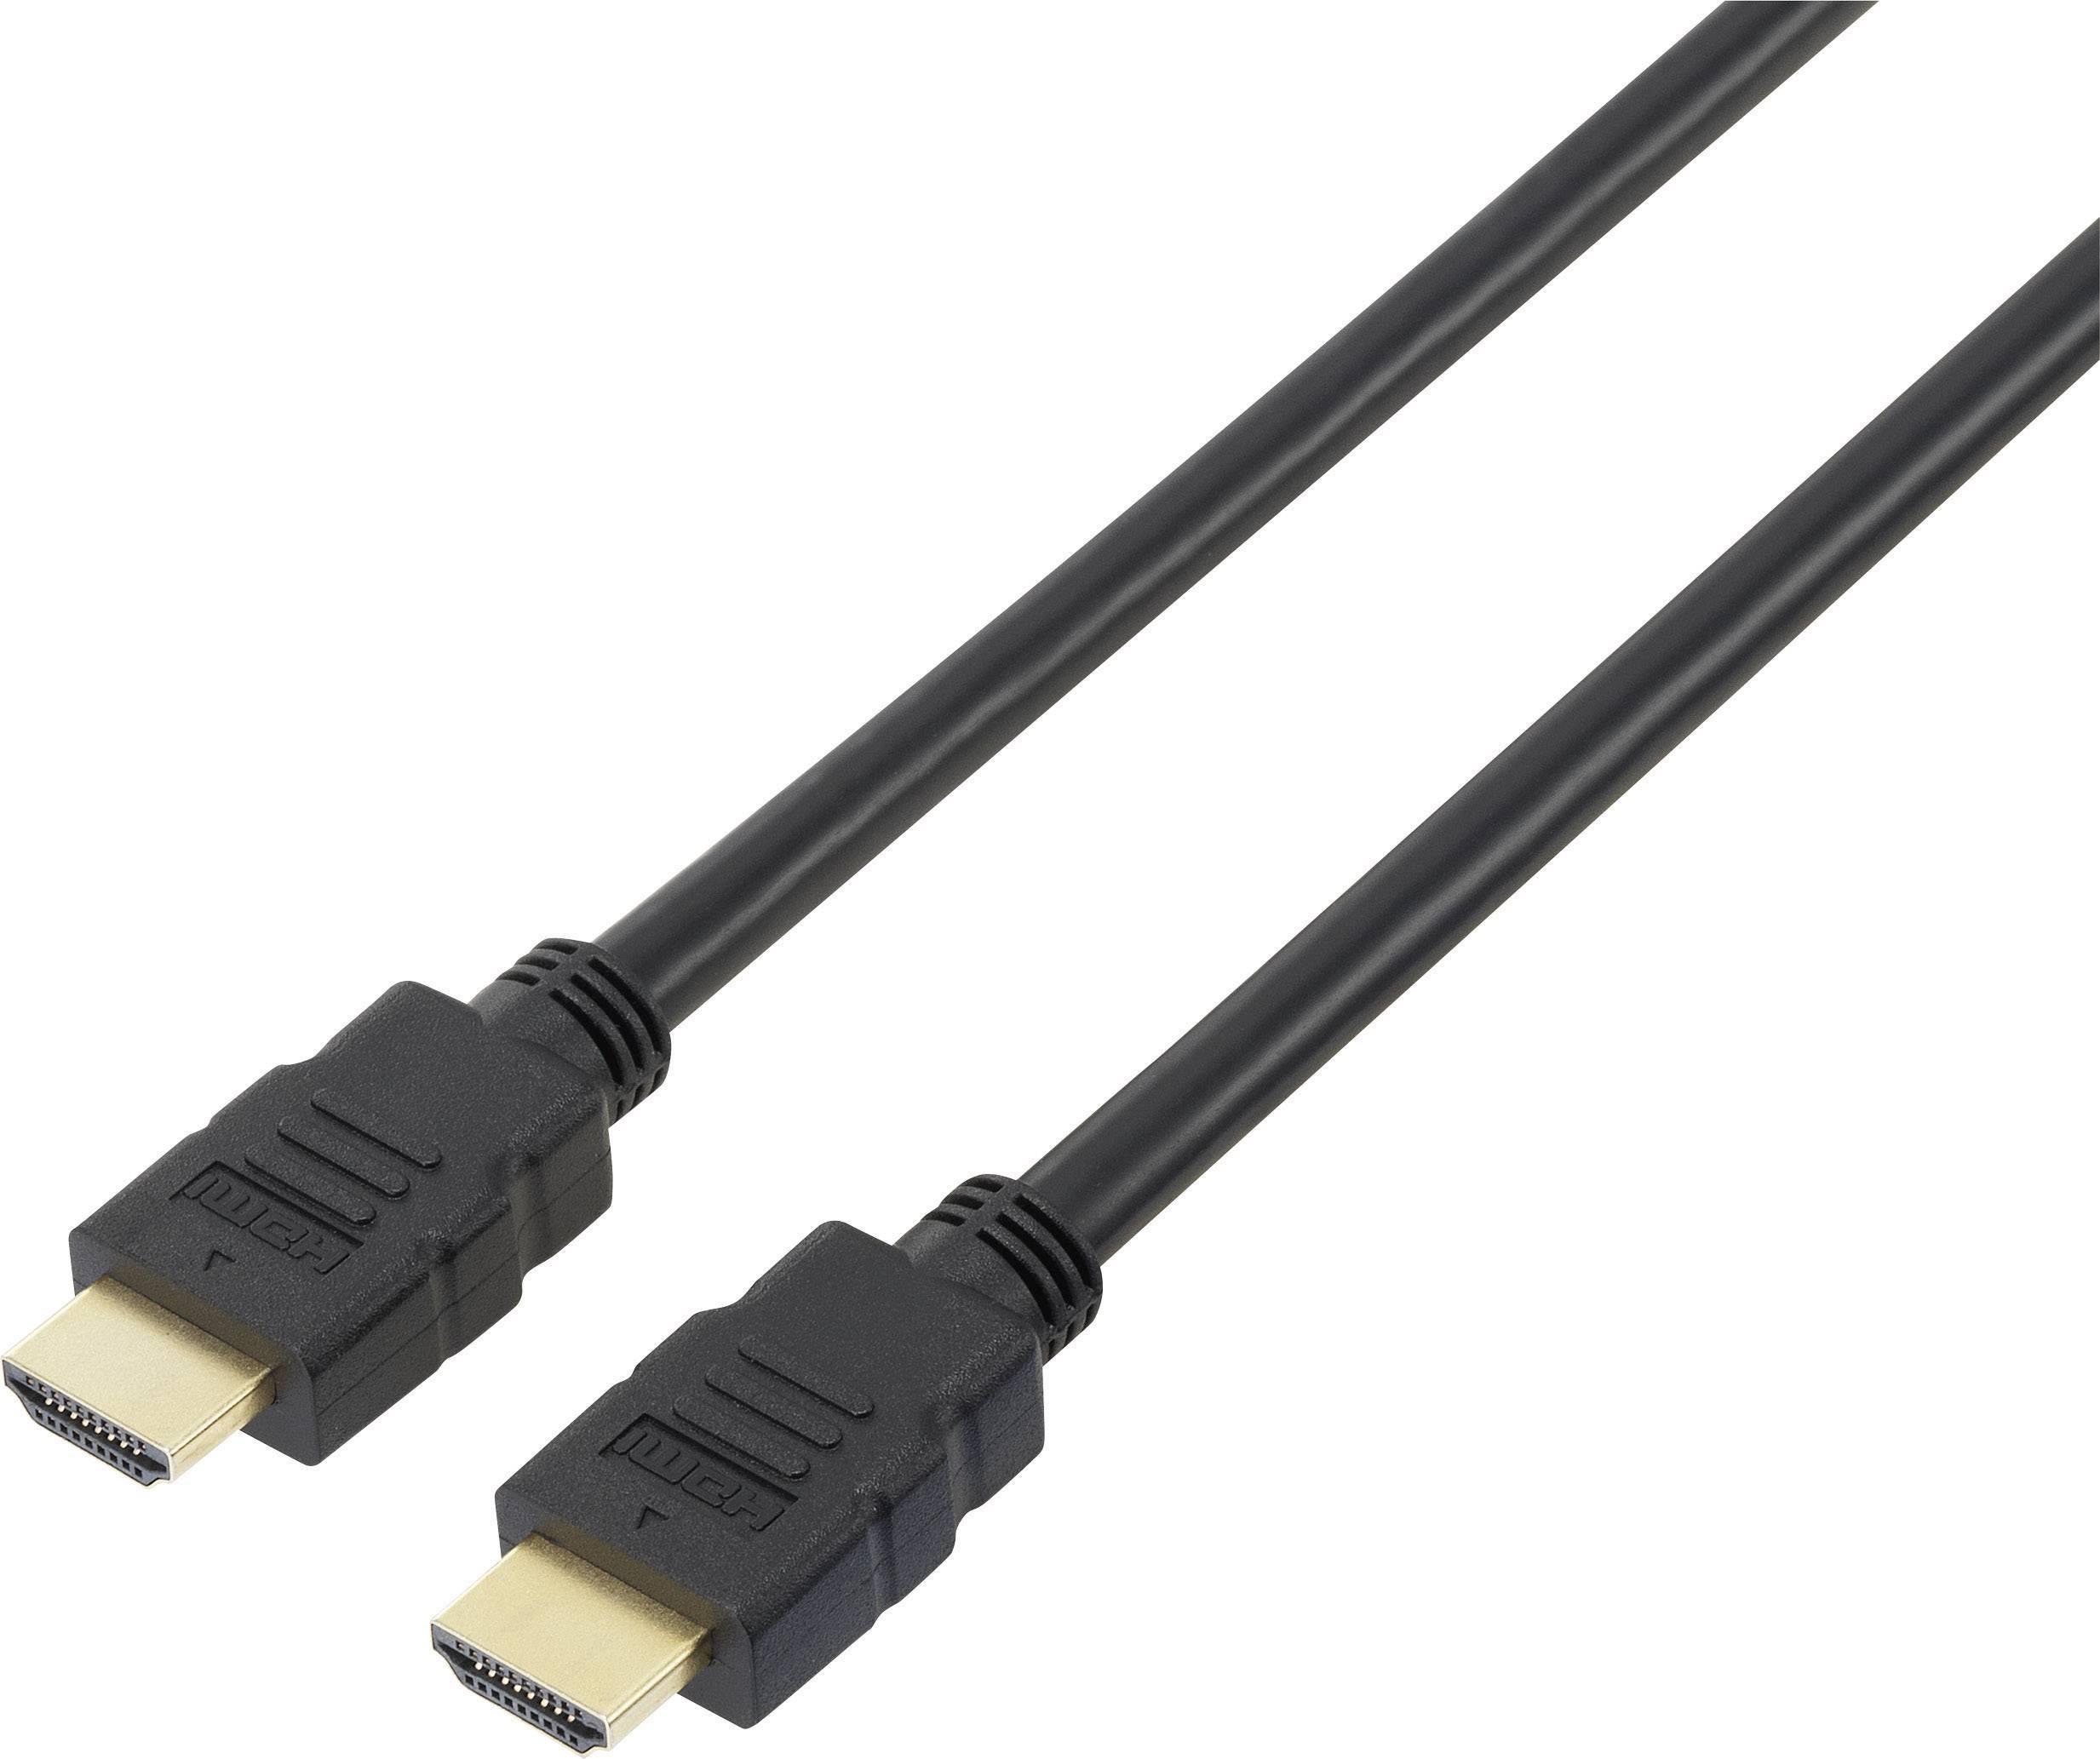 SpeaKa Professional HDMI Cavo